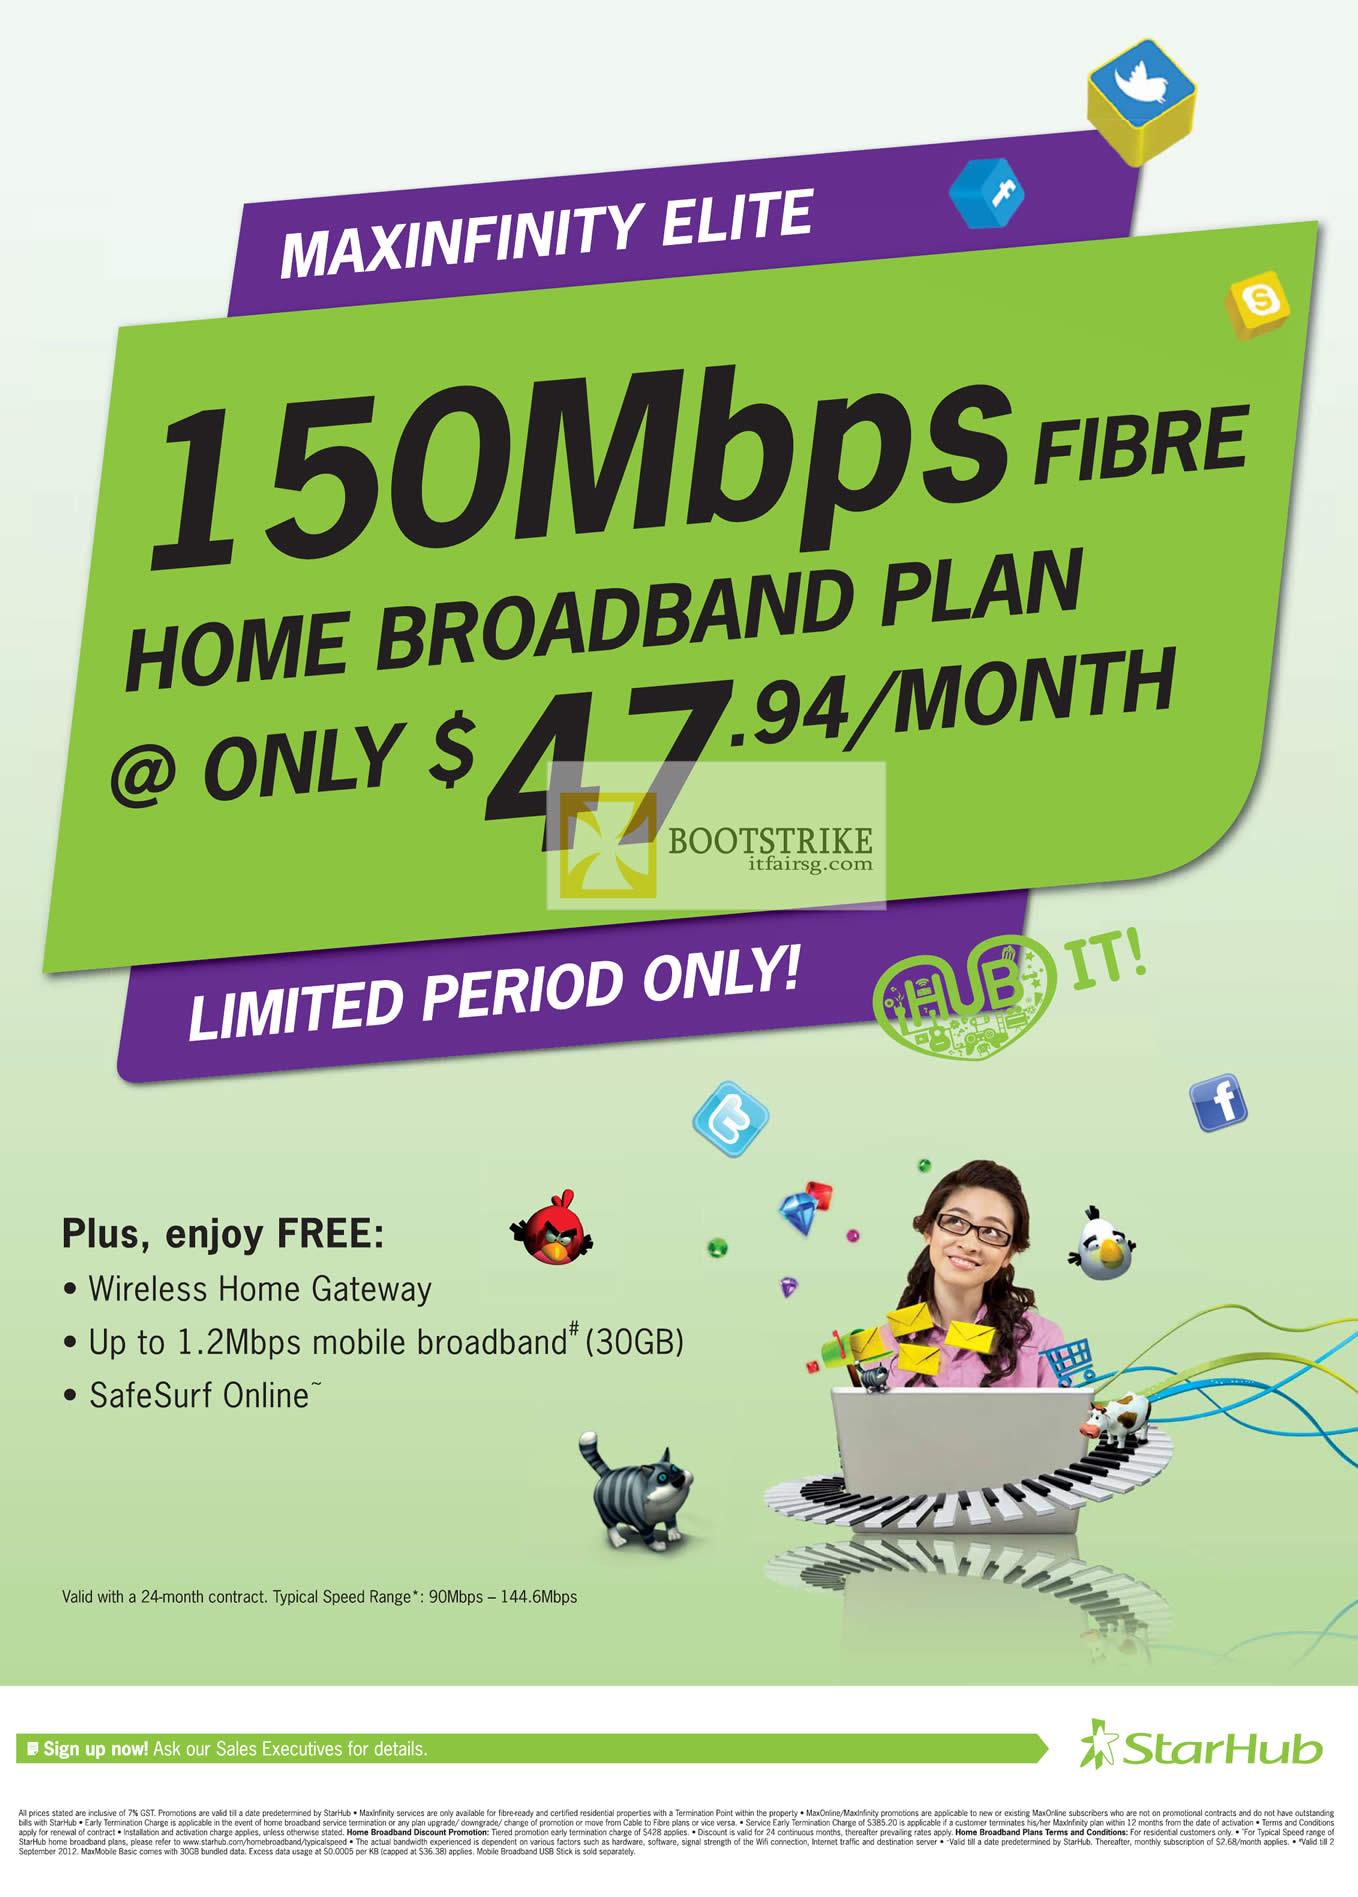 nice starhub home broadband plan. COMEX 2012 price list image brochure of Starhub Broadband 47 94 Fibre  150Mbps Free Gateway 1 2Mbps Mobile